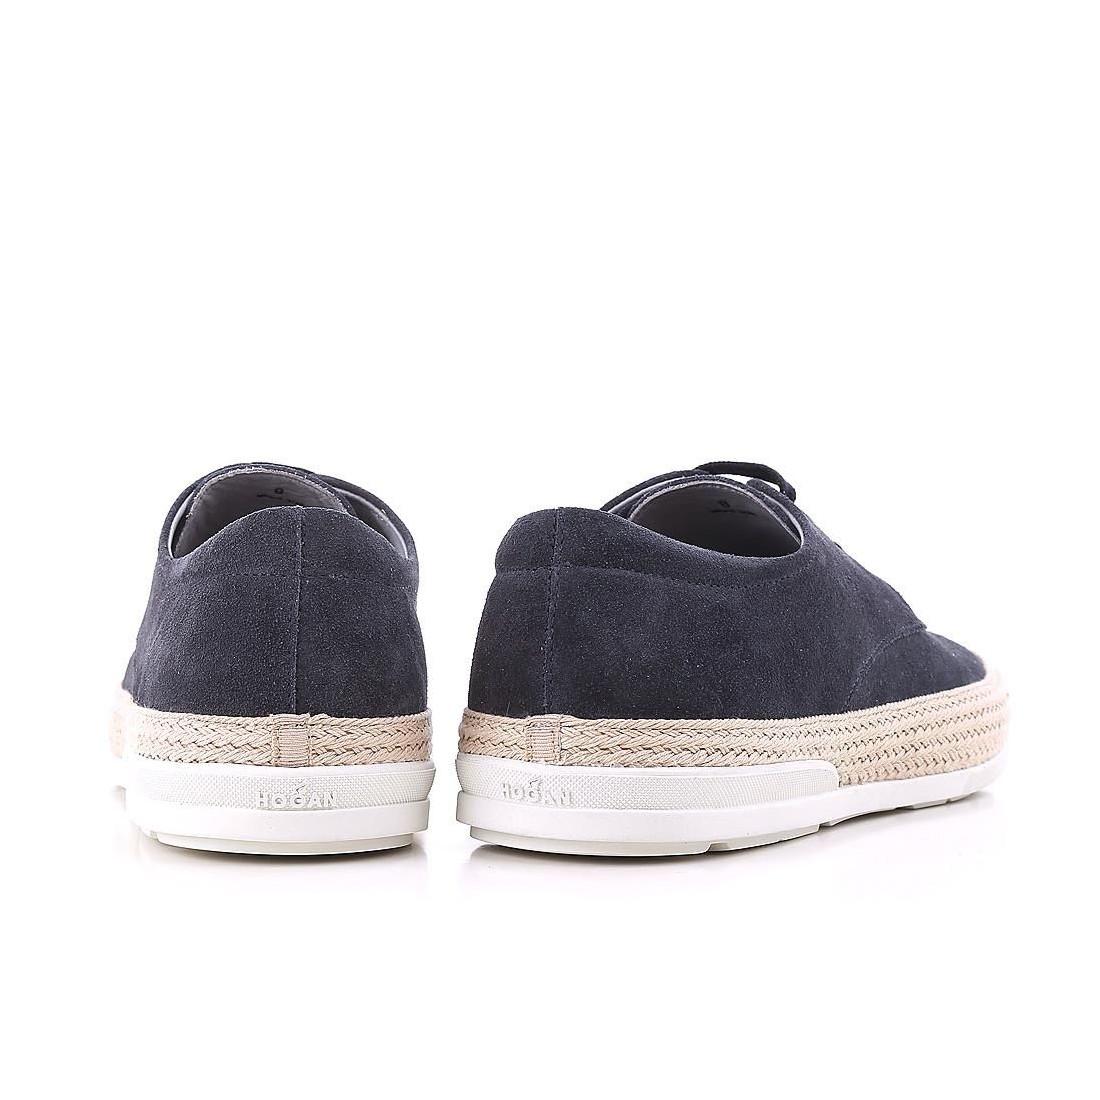 sneakers uomo hogan hxm3580af50hg0u805 3064